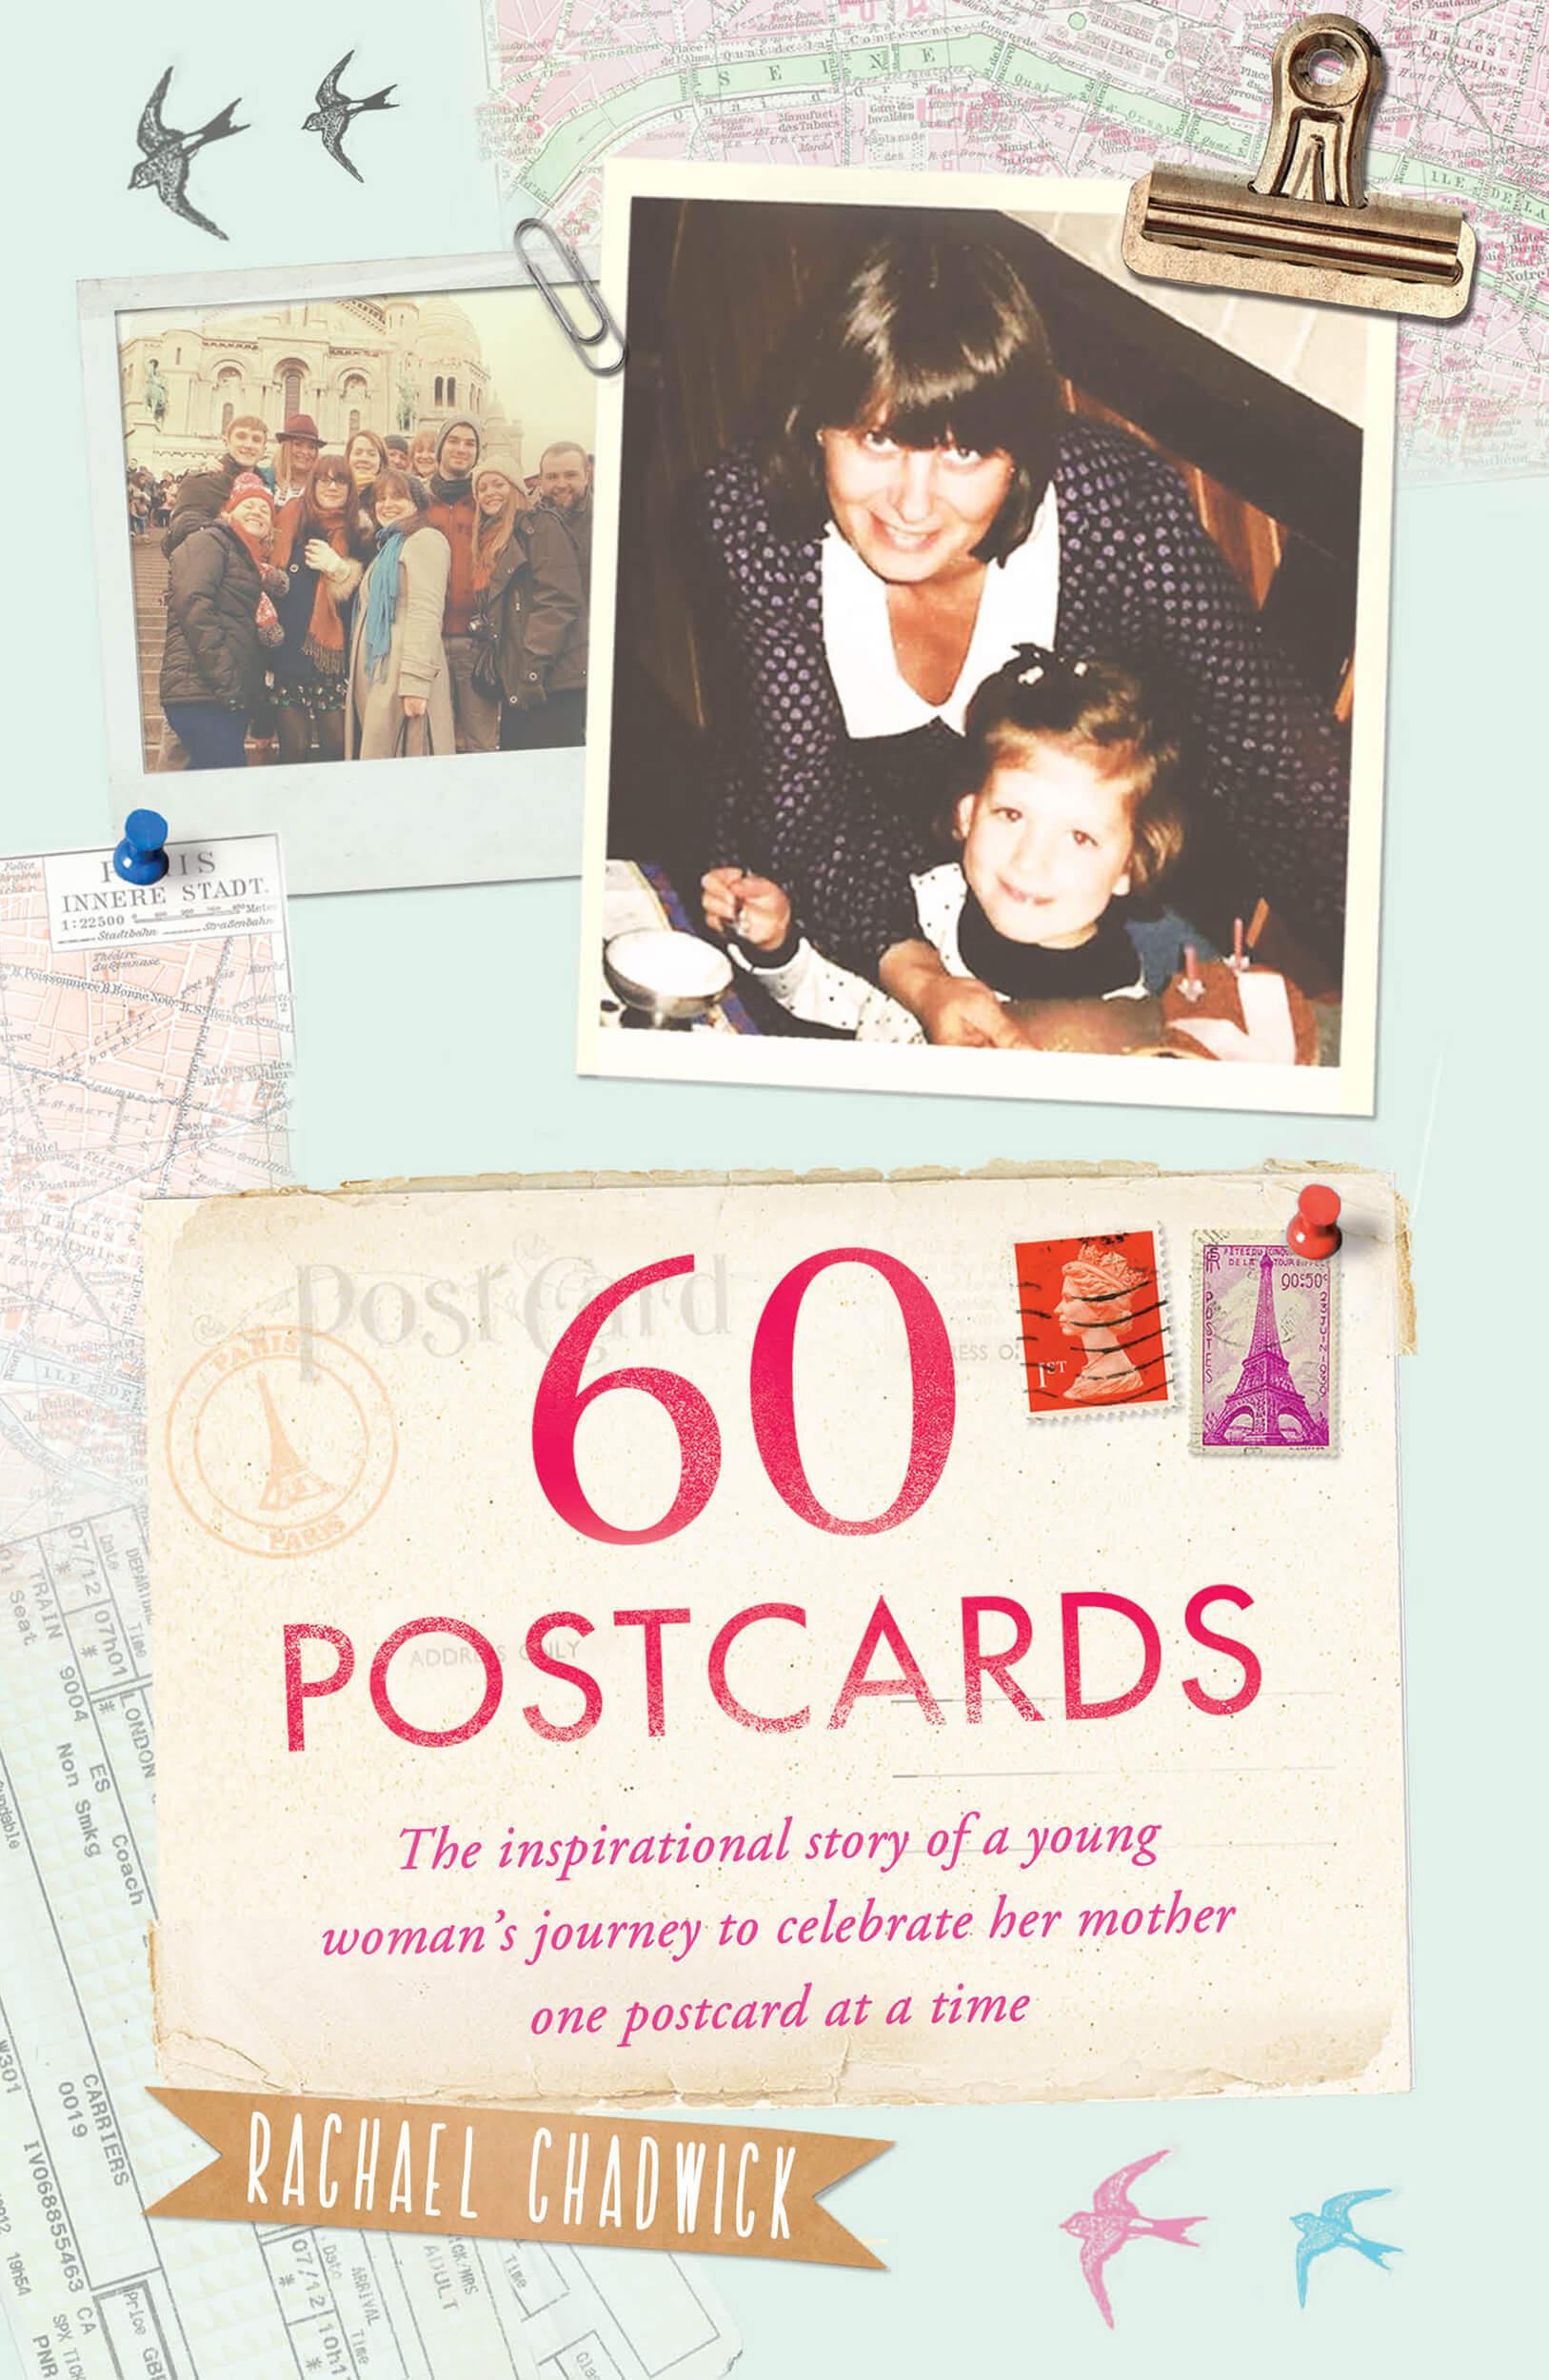 What Happens after Death, 60 Postcards, book, blog, Paris, tribute, Rachael Chadwick